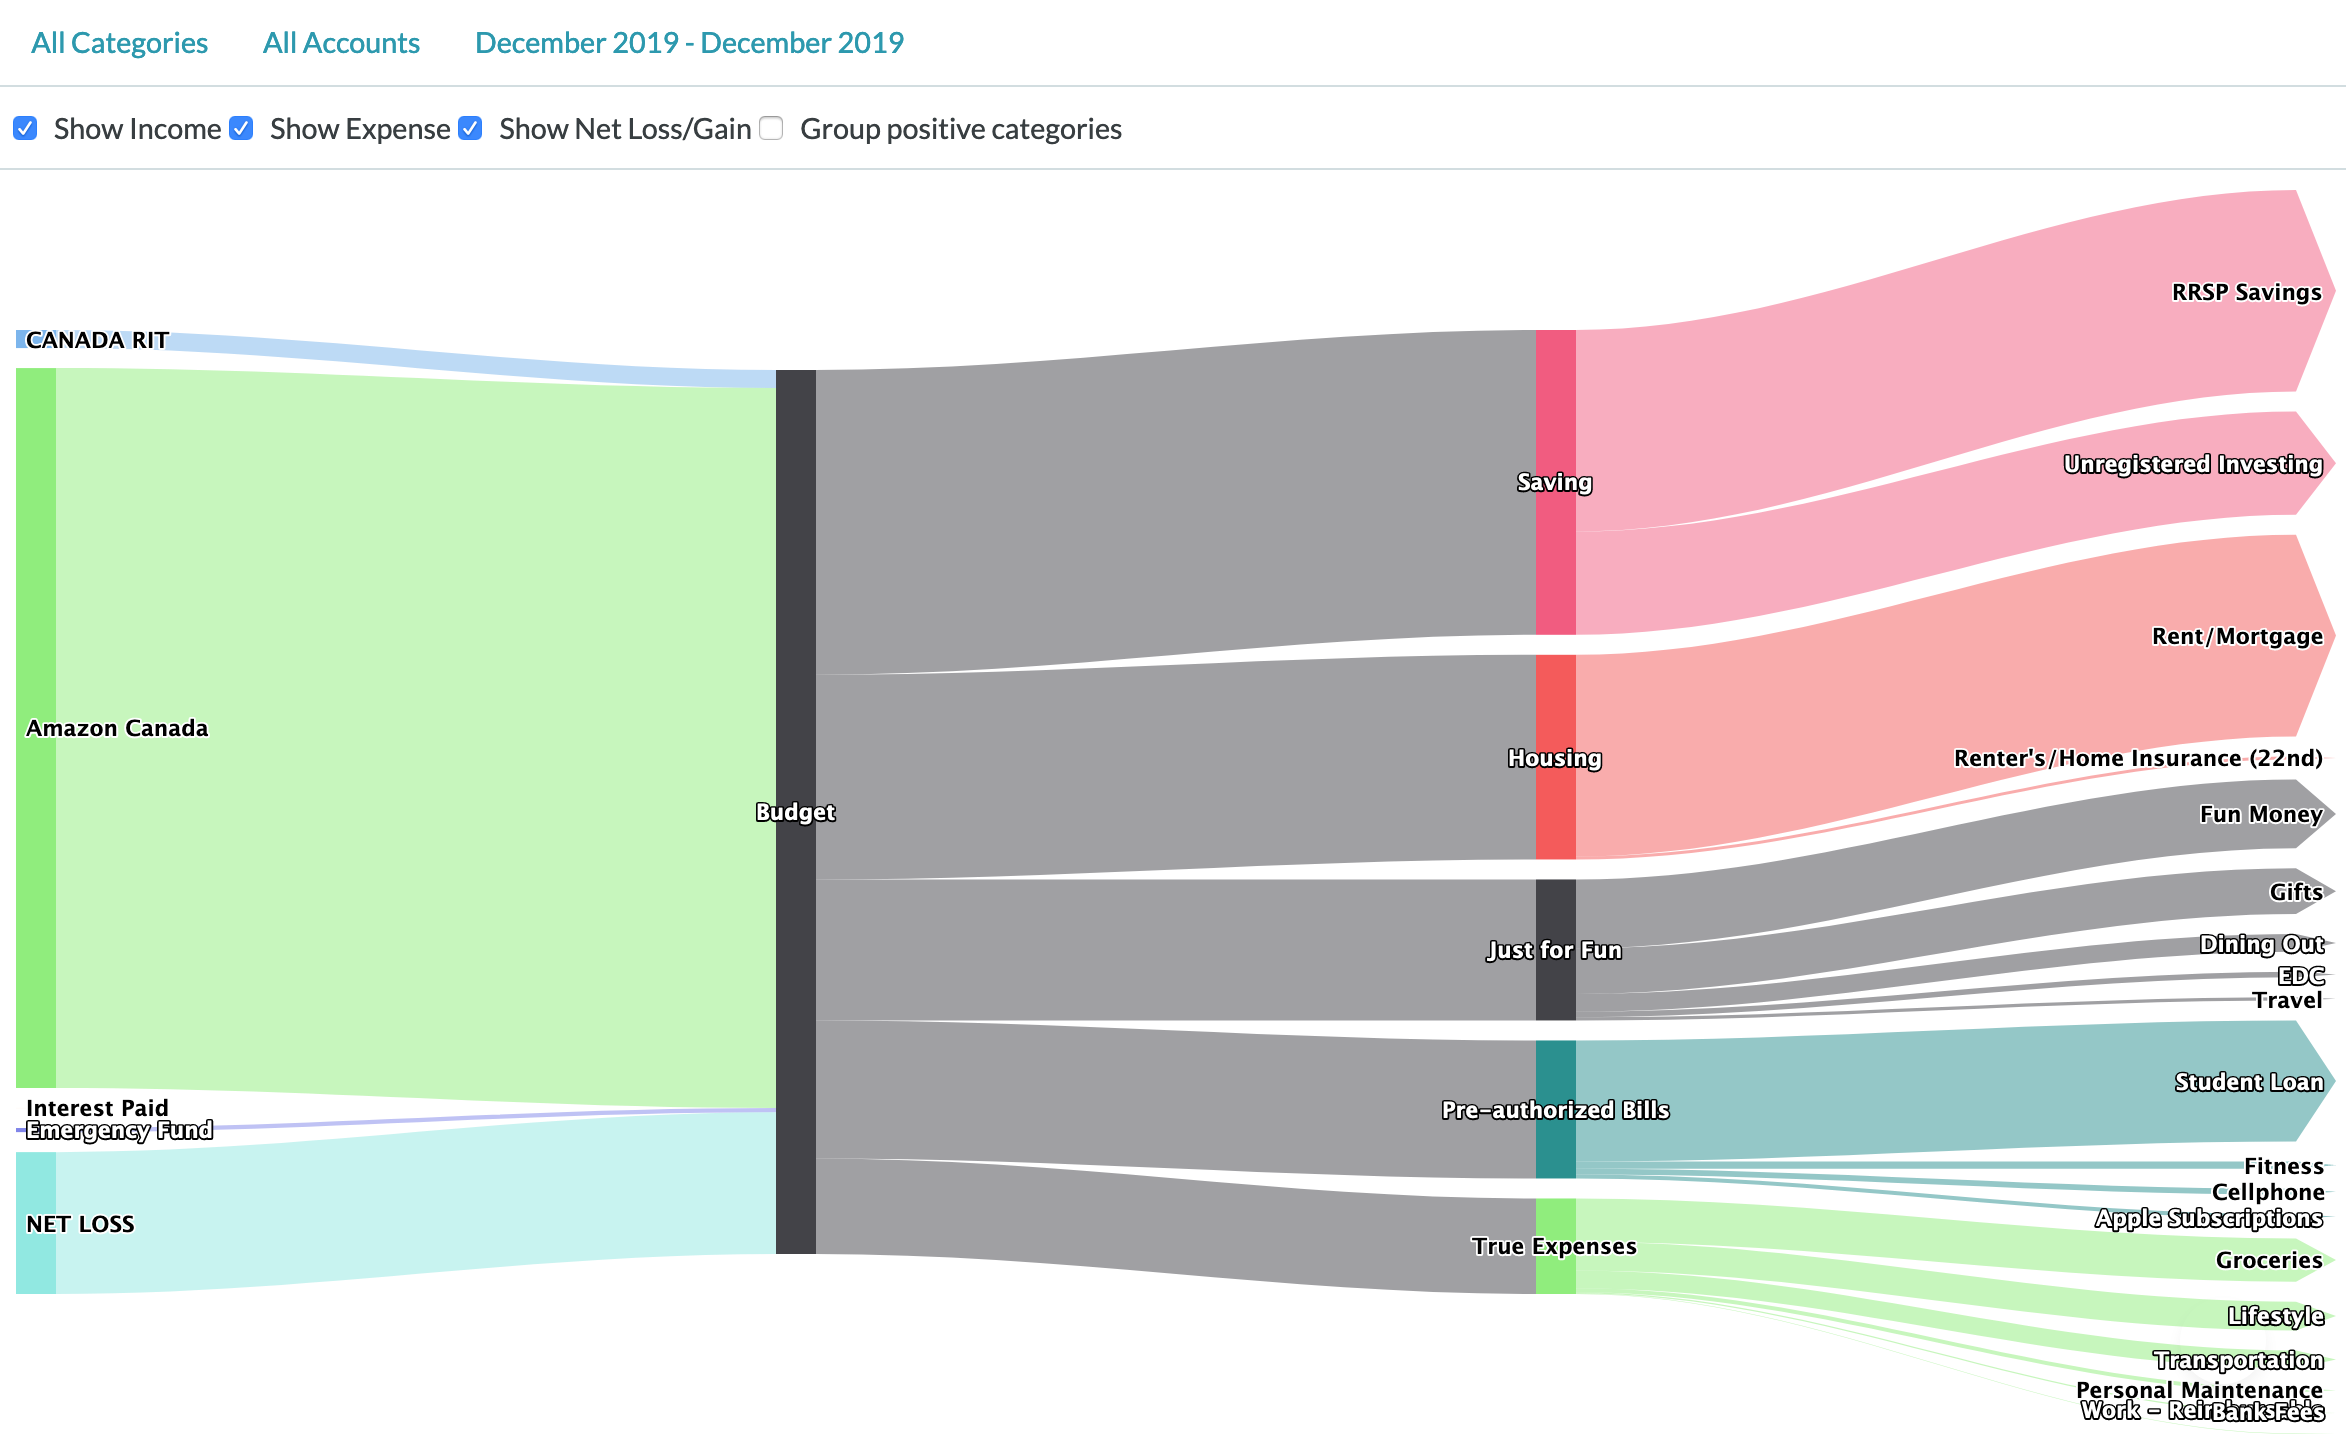 YNAB Toolkit income breakdown screenshot